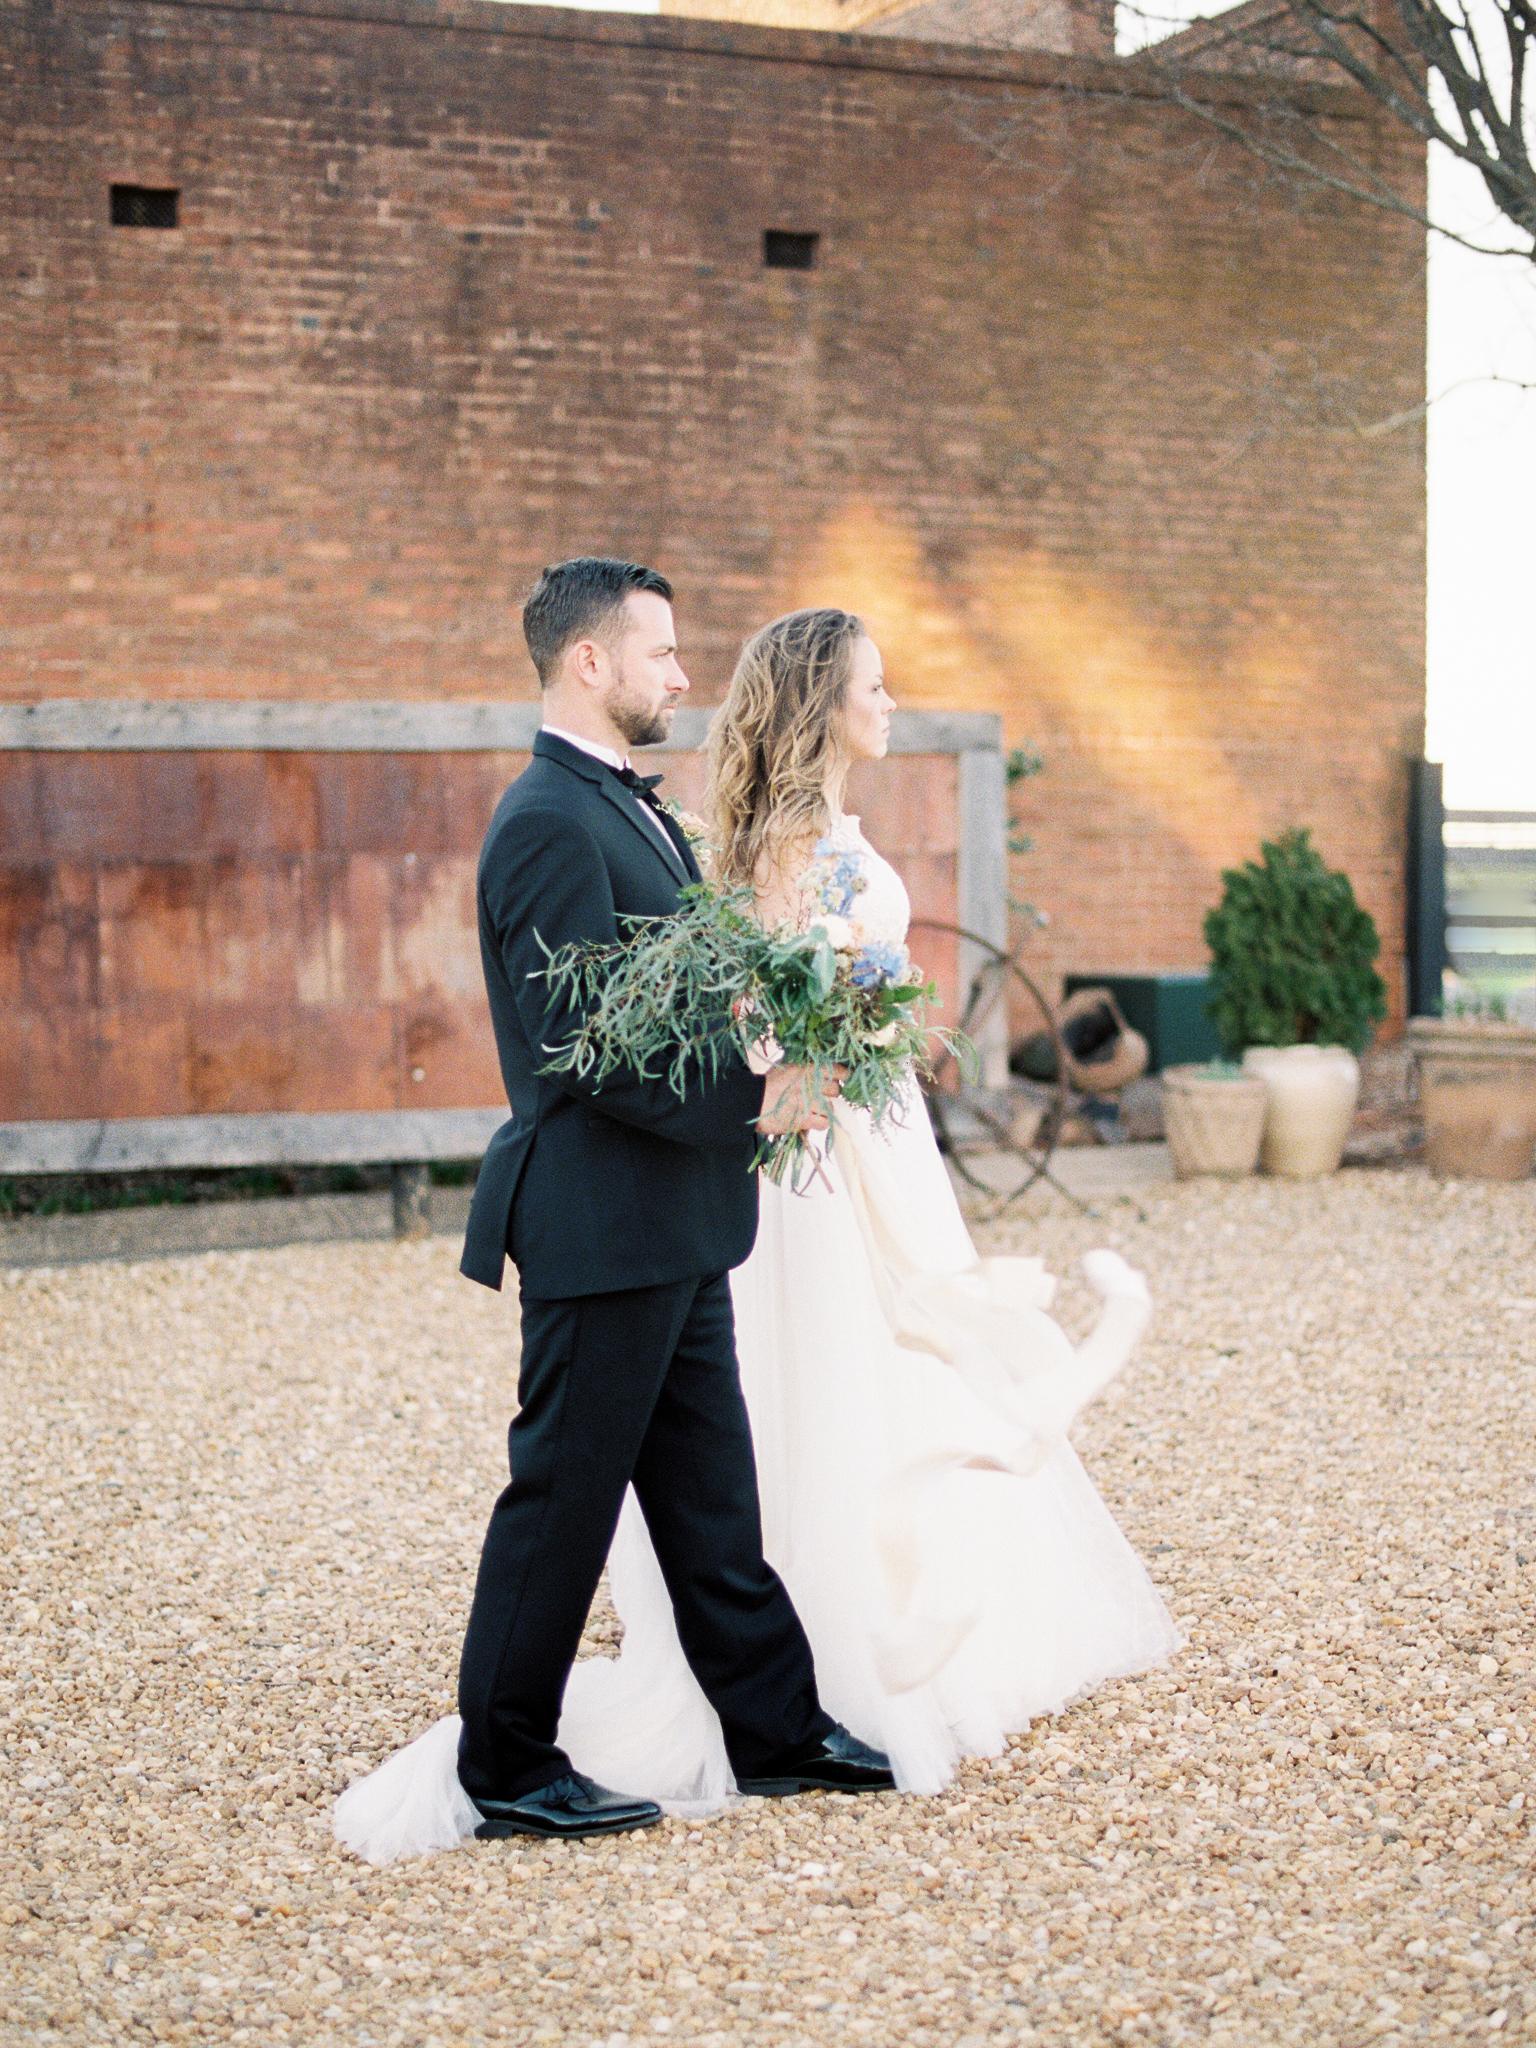 christinadavis+weddinginspiration36.jpg